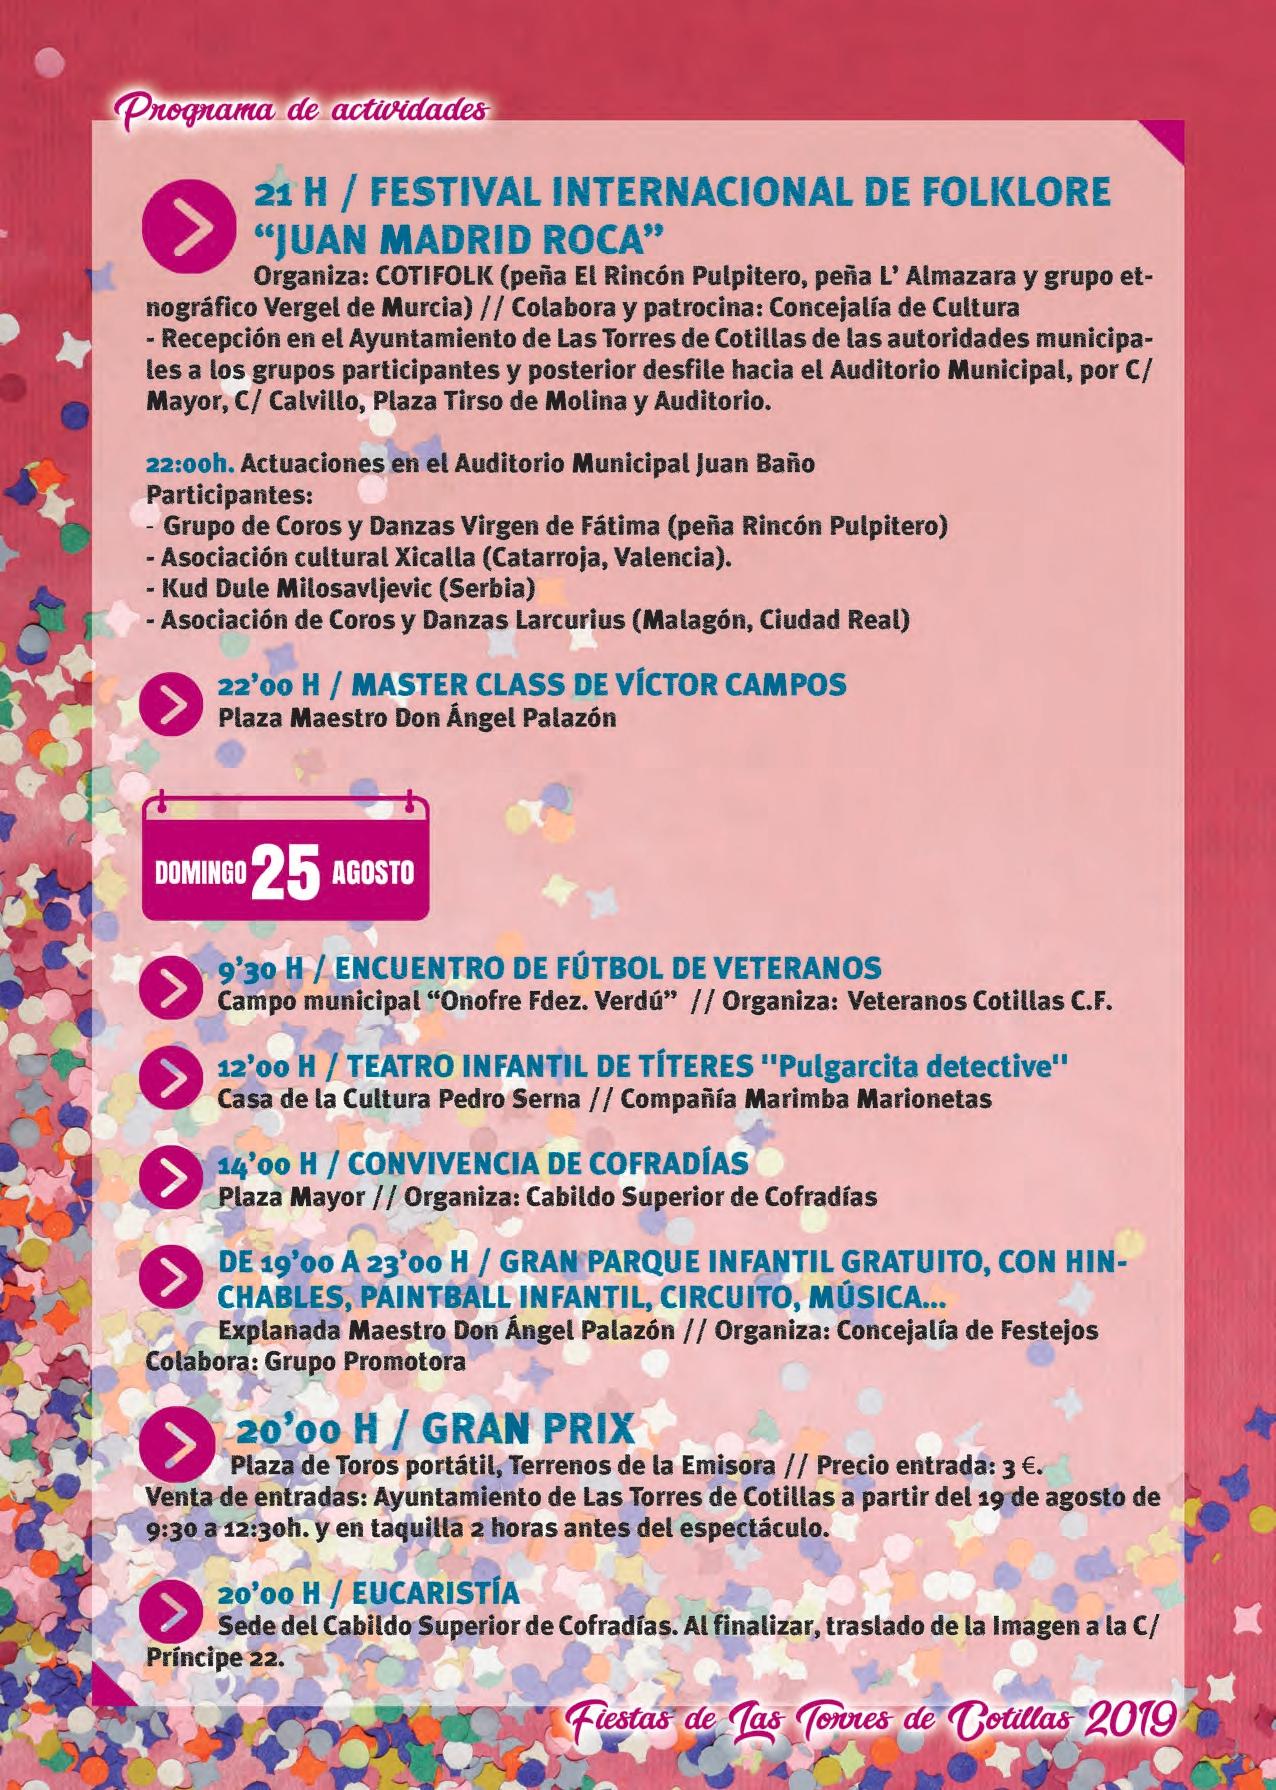 Libro-fiestas-LTC-2019_baja_page-0023.jpg